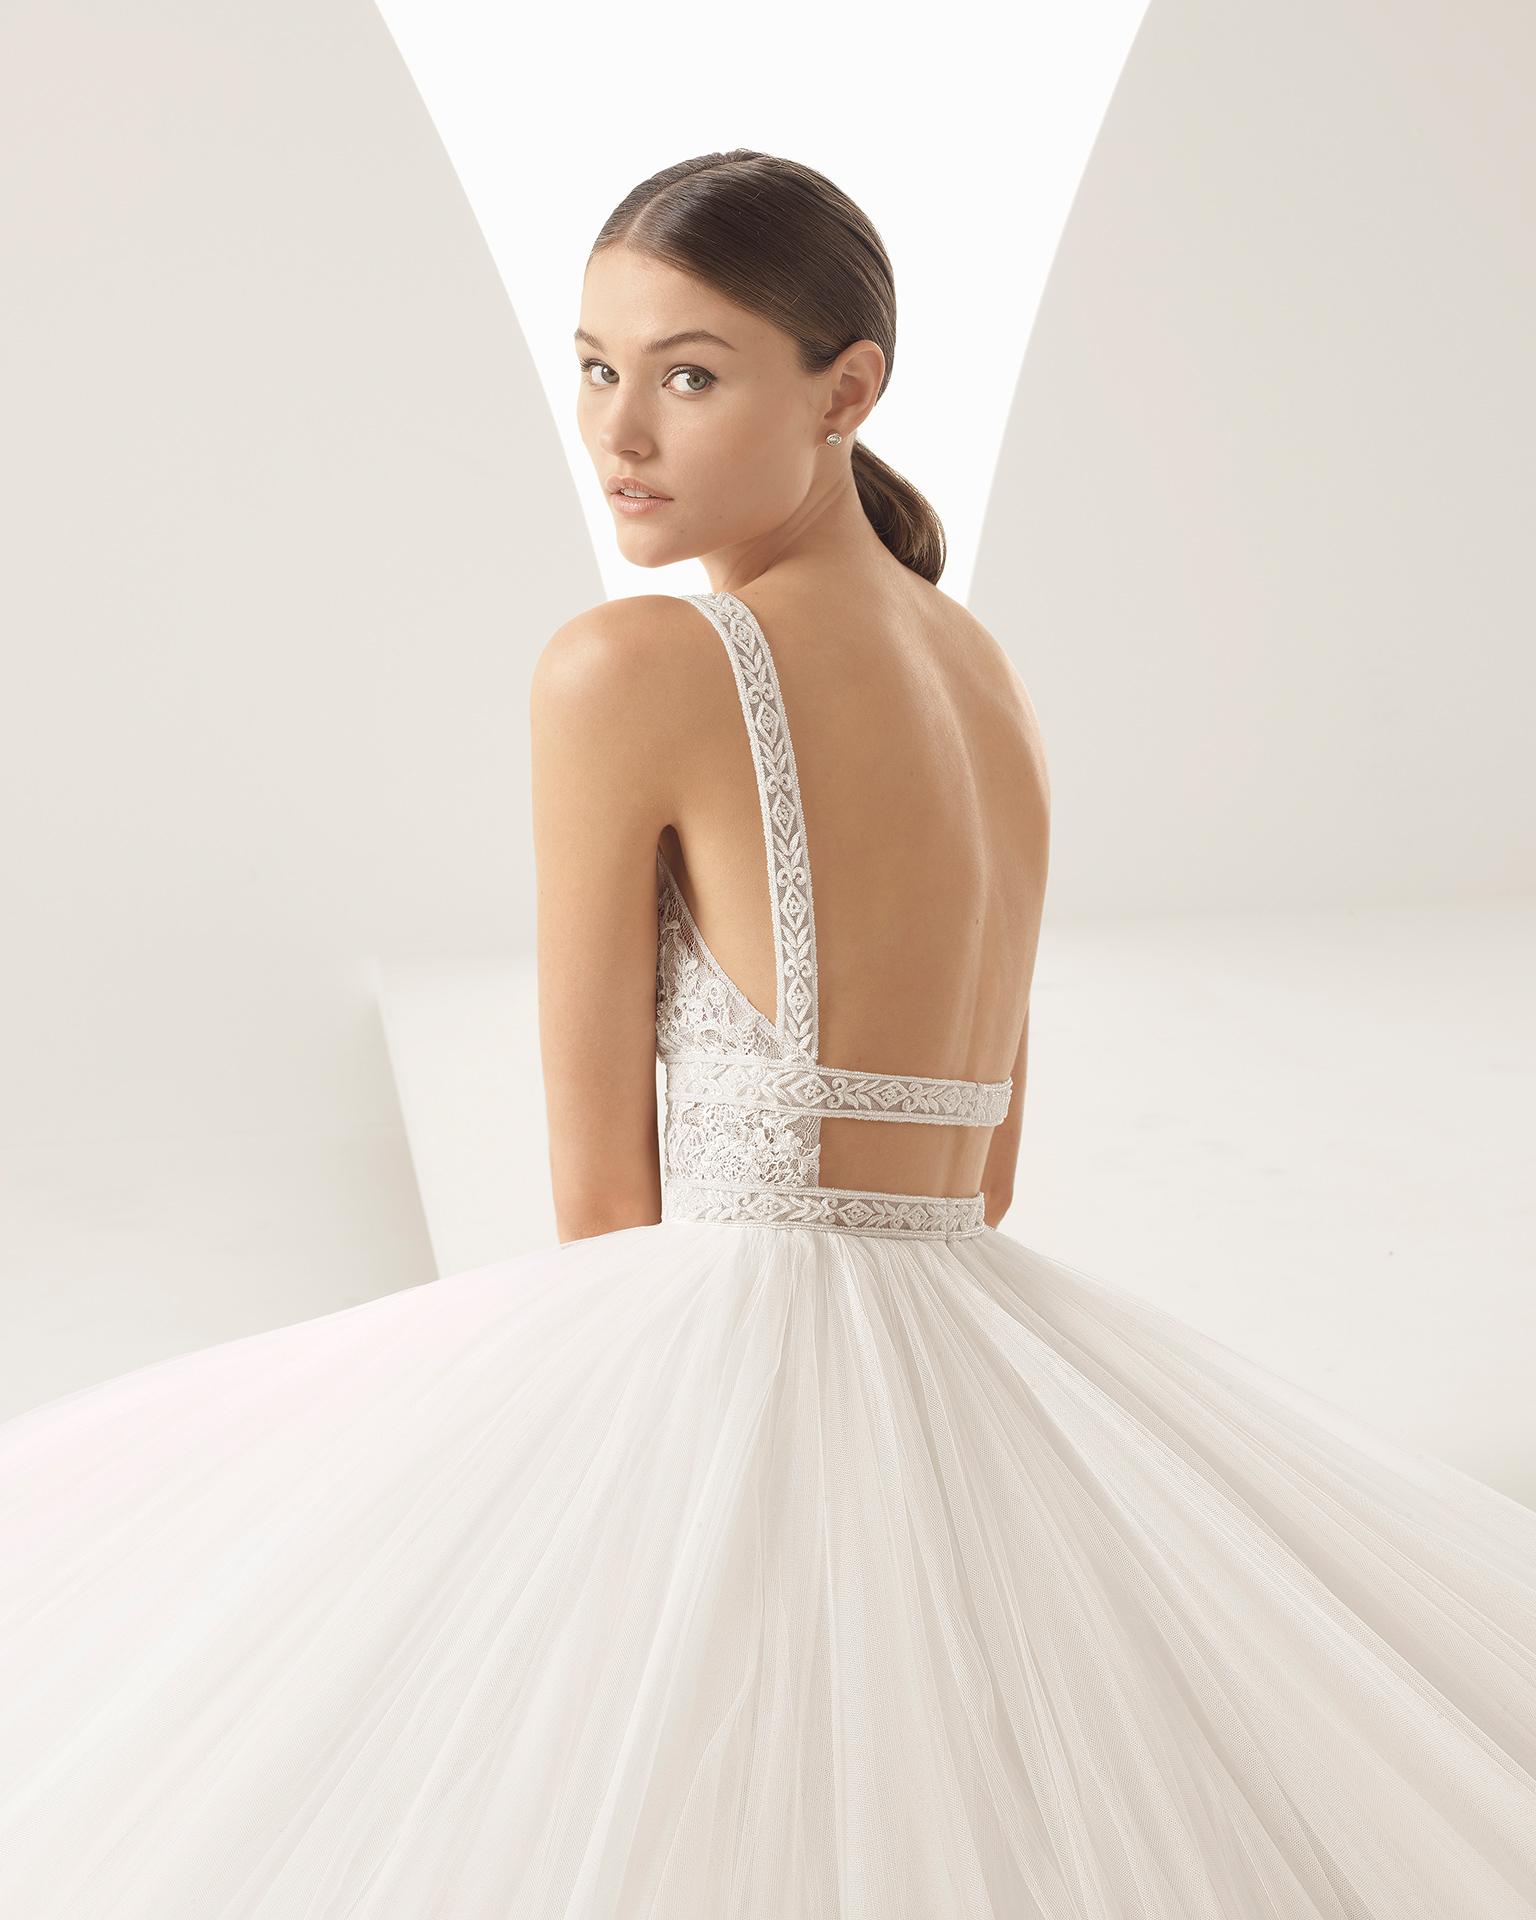 H M Wedding Dresses 2018 - Wedding Dresses Asian